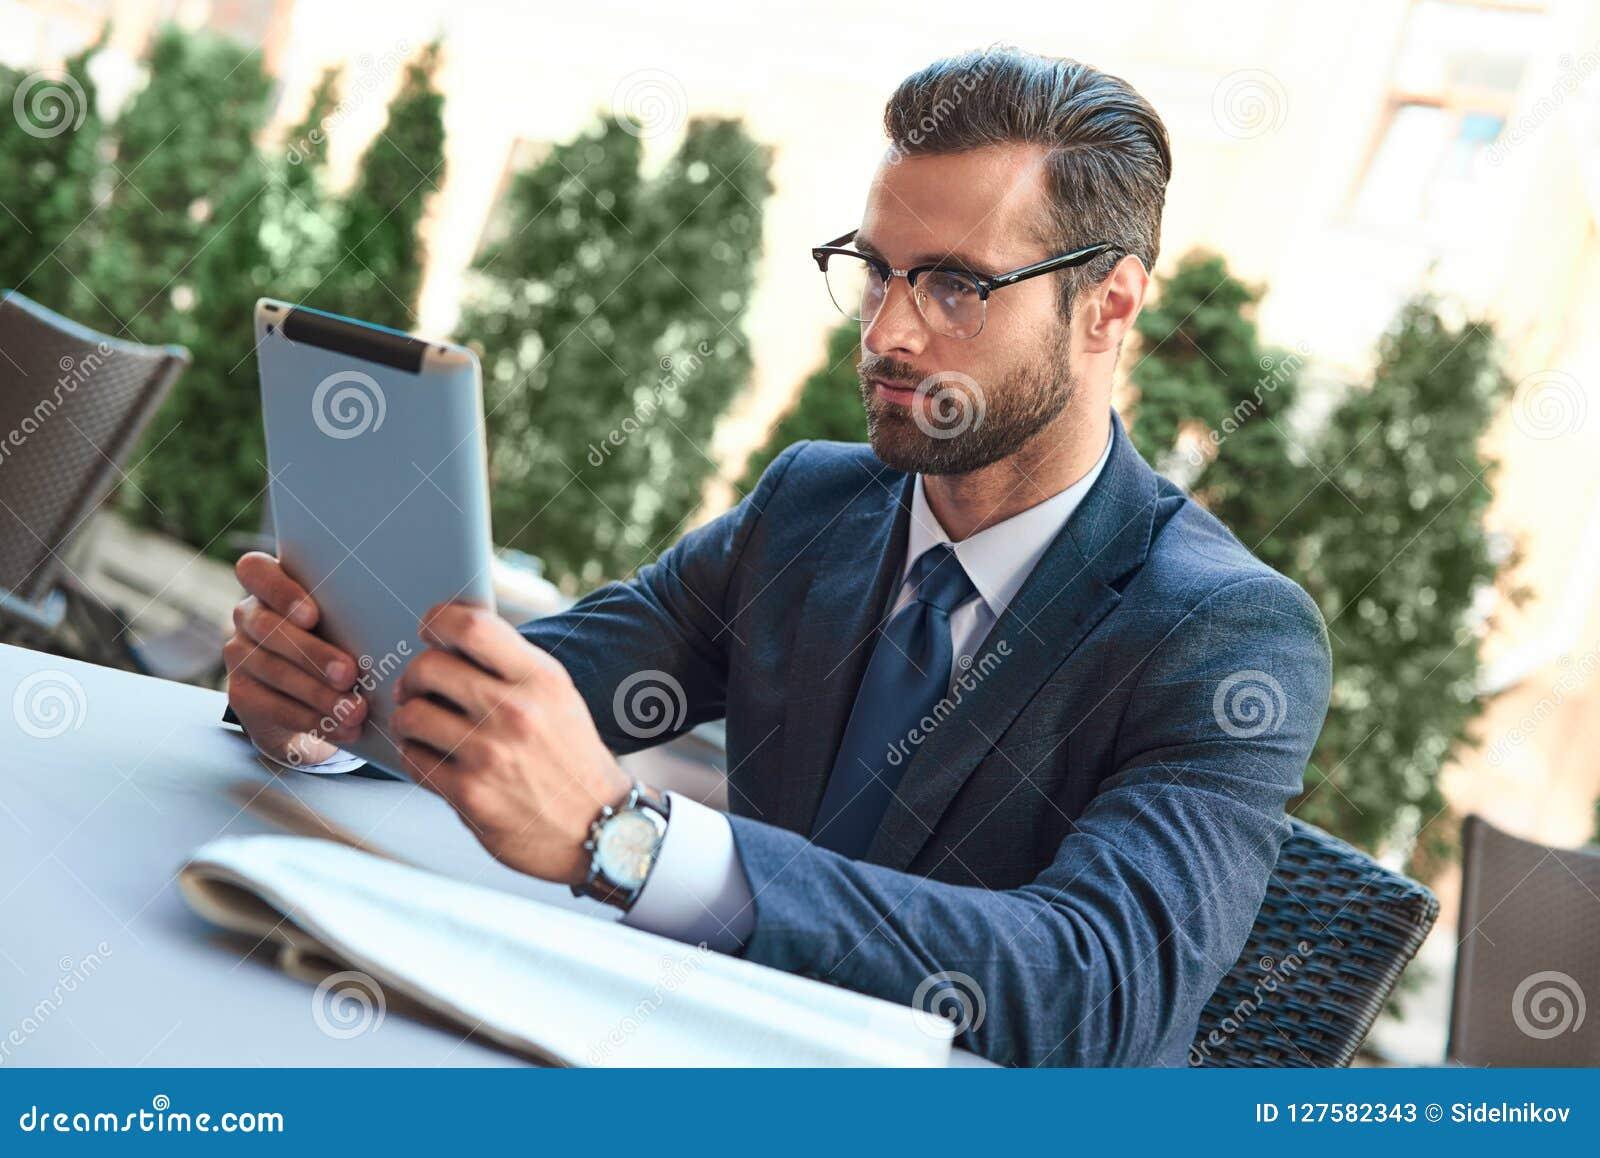 Молодой бизнесмен с бородой и нося стеклами сидящ и смотрящ таблетка